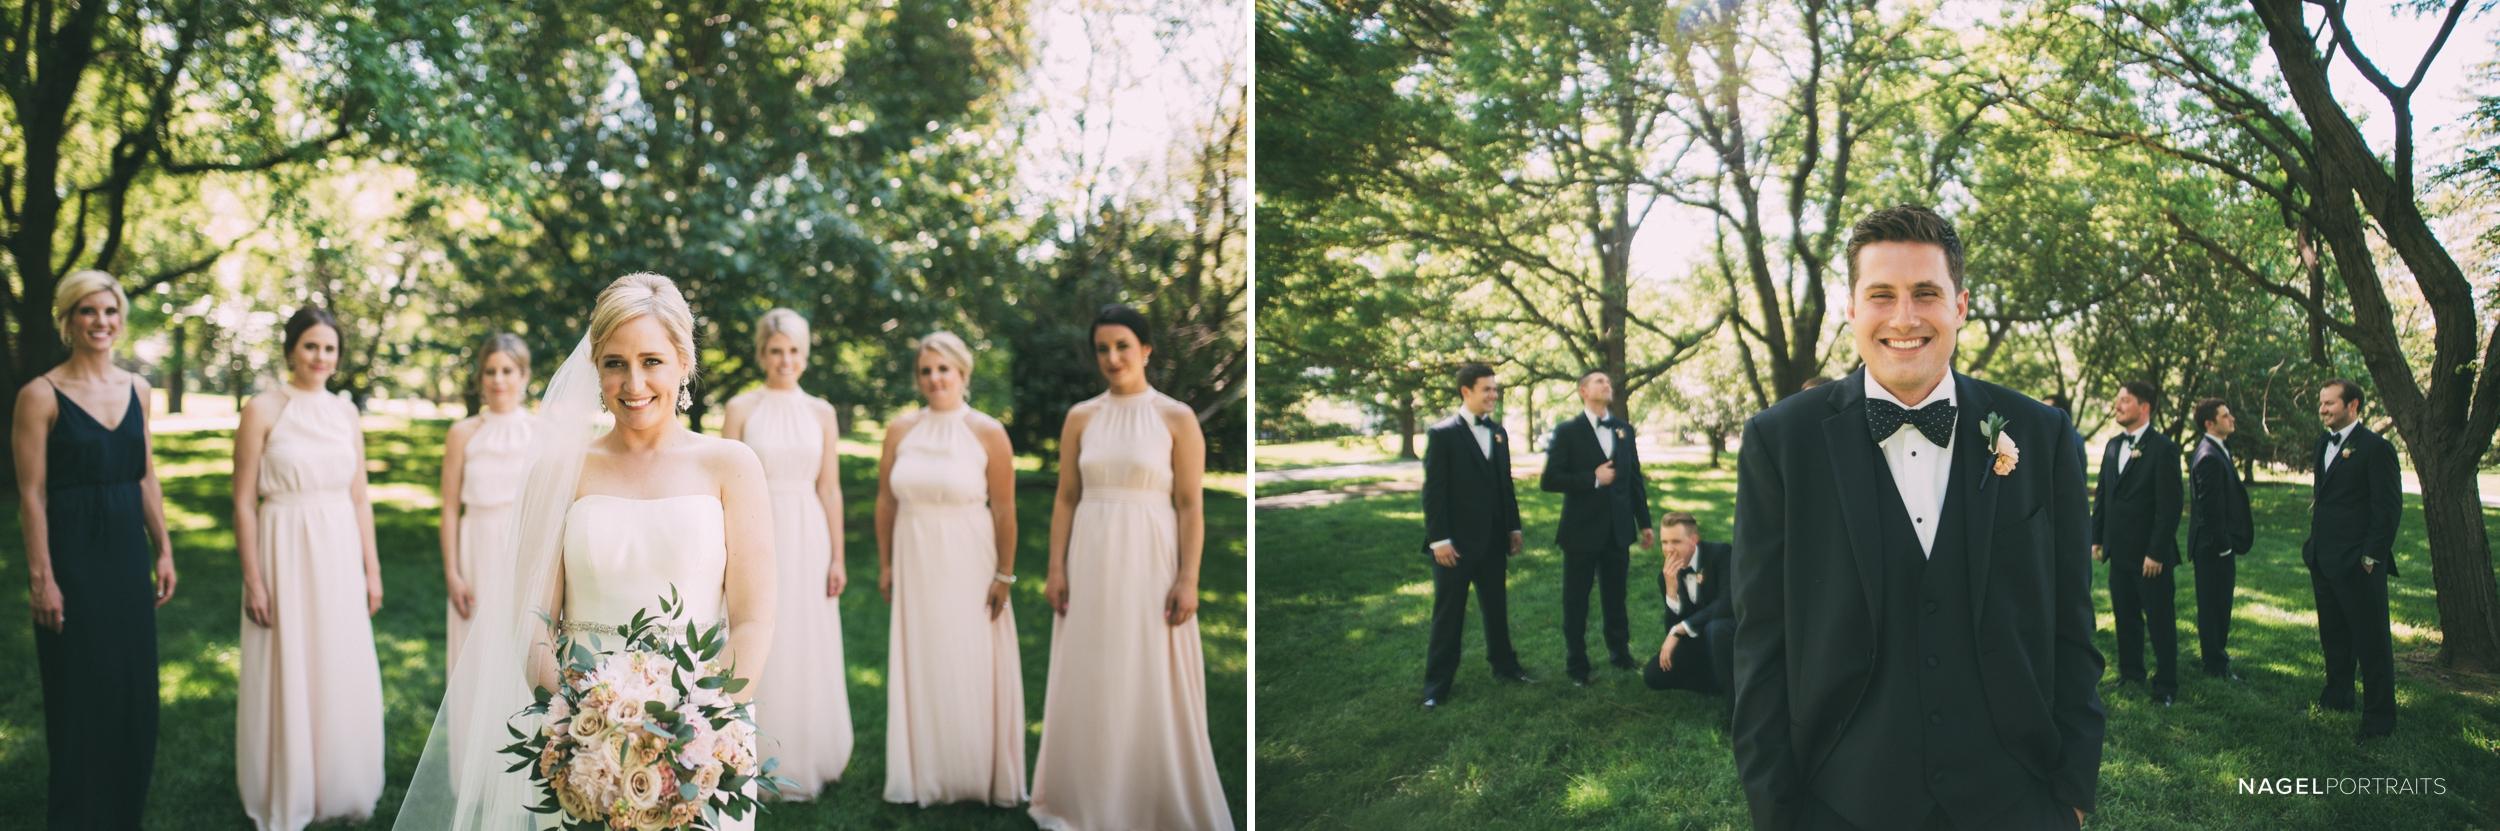 Wedding Blog 13.jpg